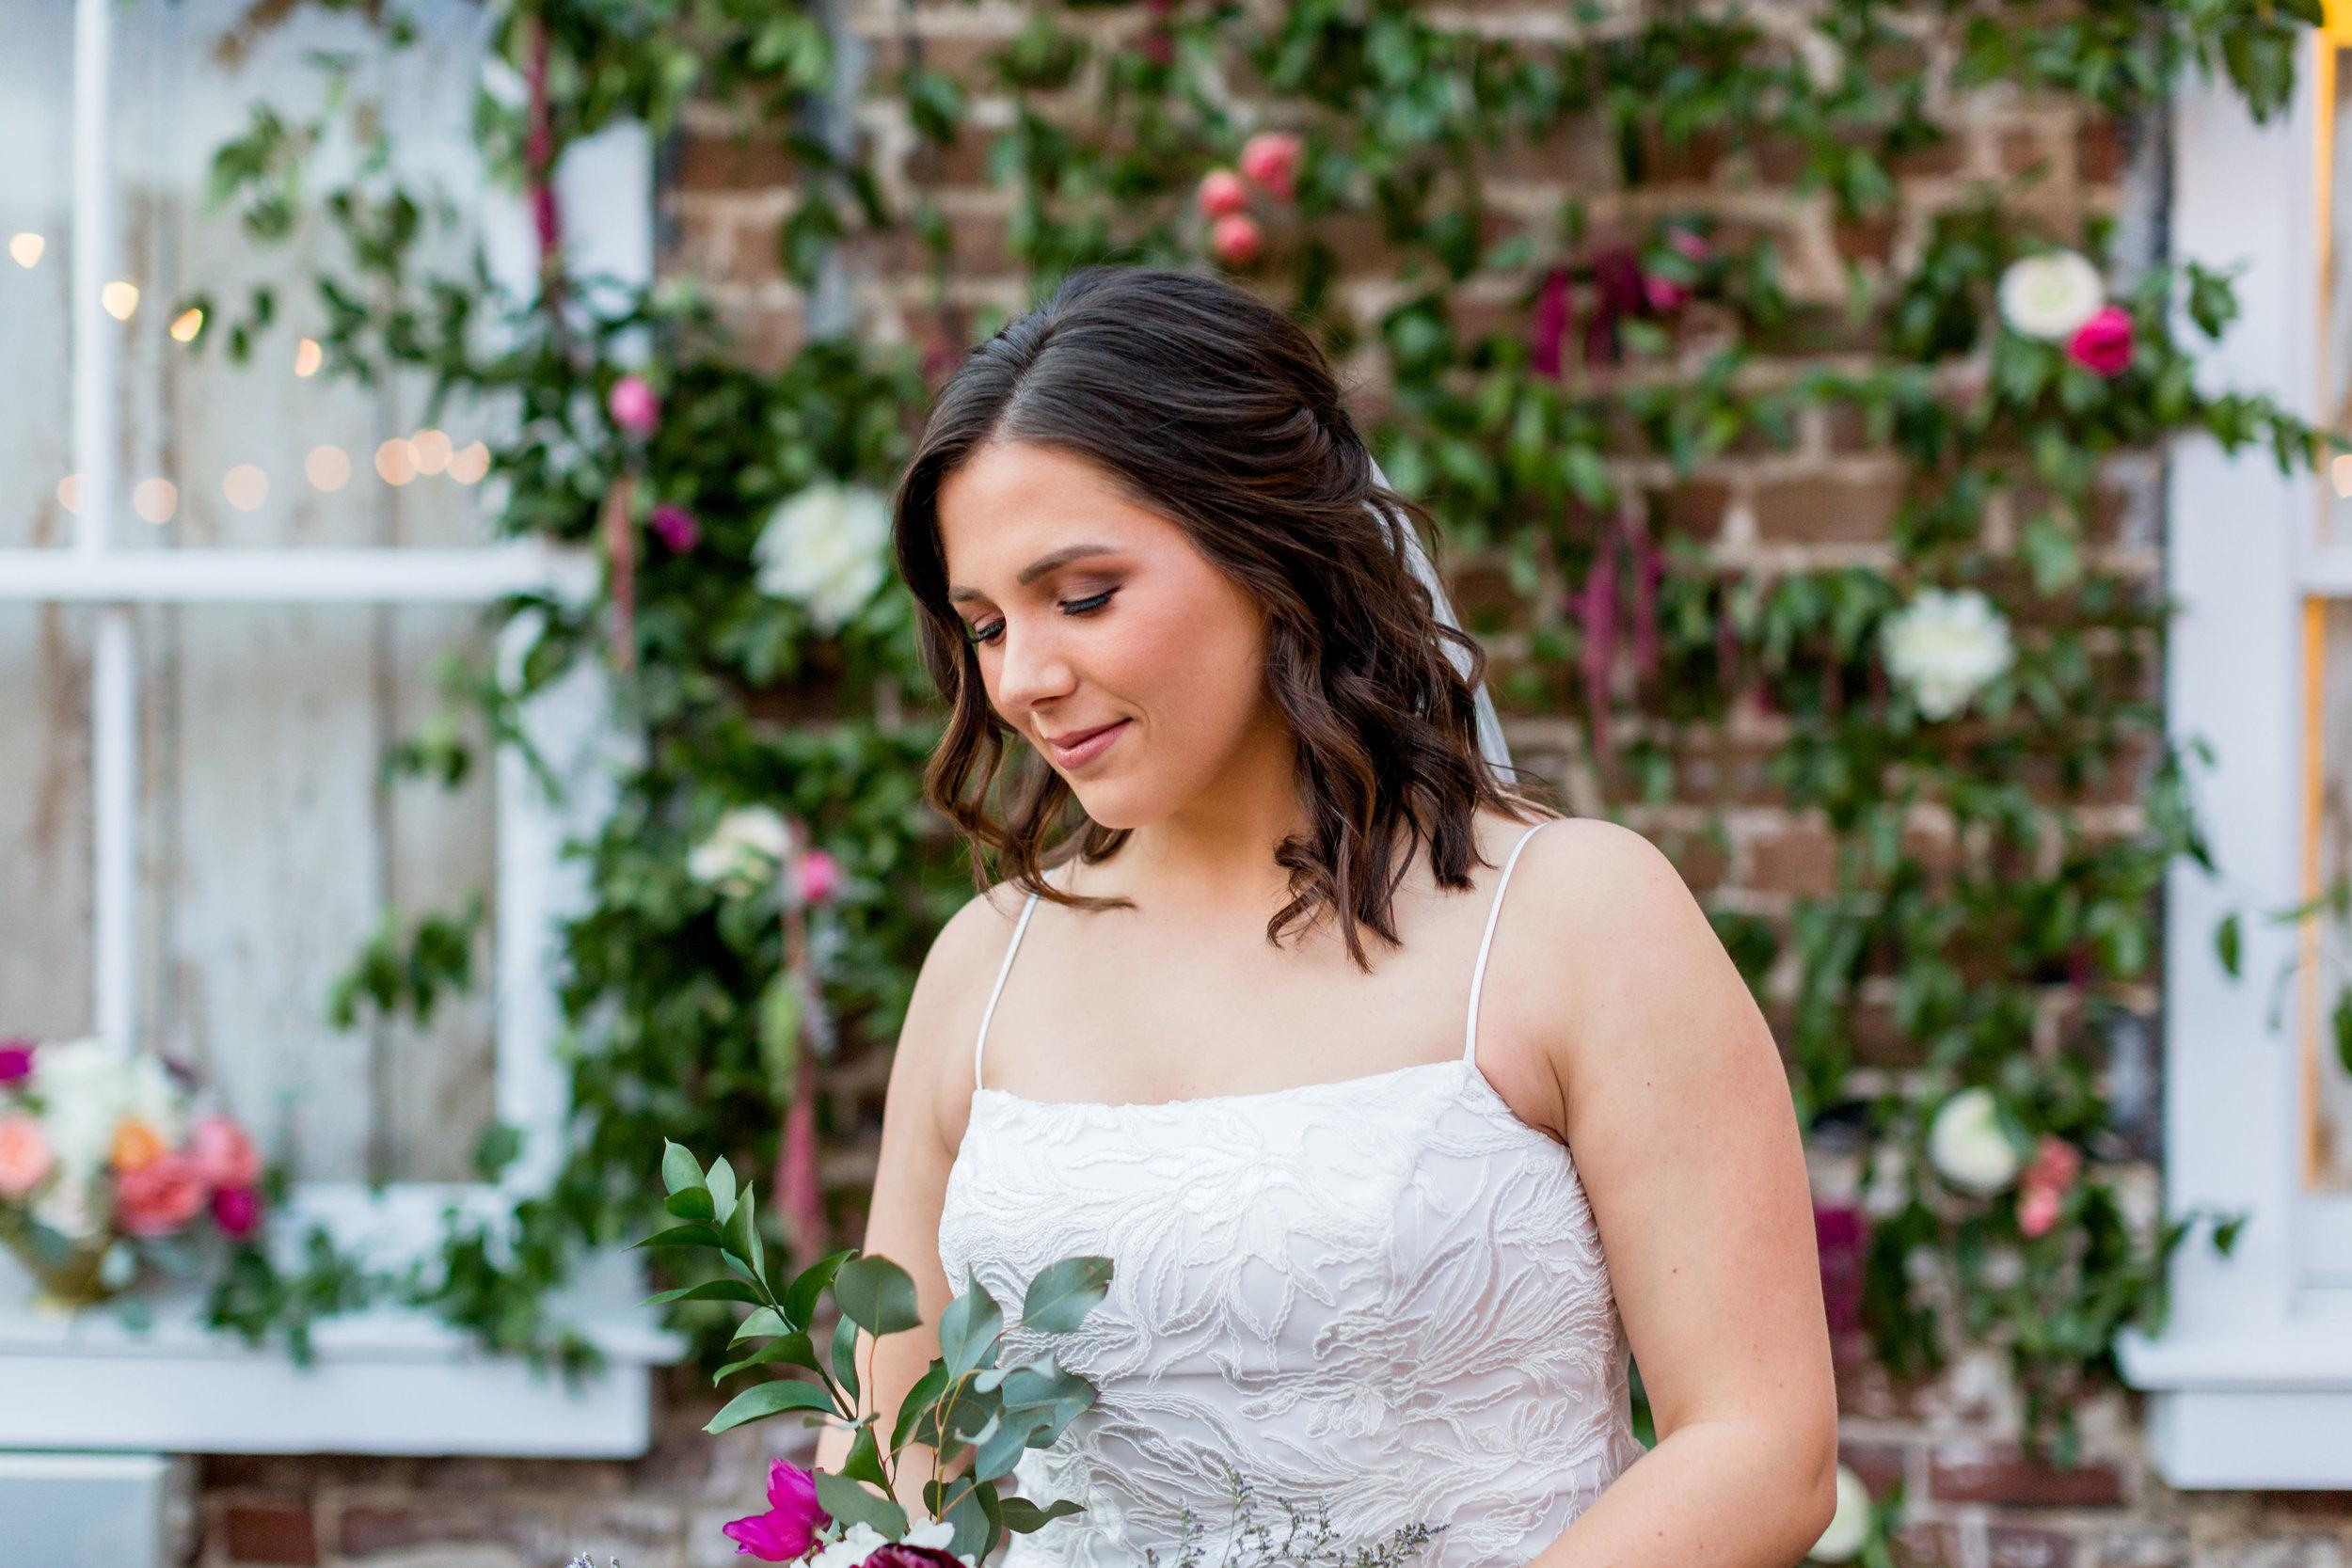 charleston new years elopement popup surprise wedding at upstairs at midtown - scarlet plan & design wedding planners (279).jpg